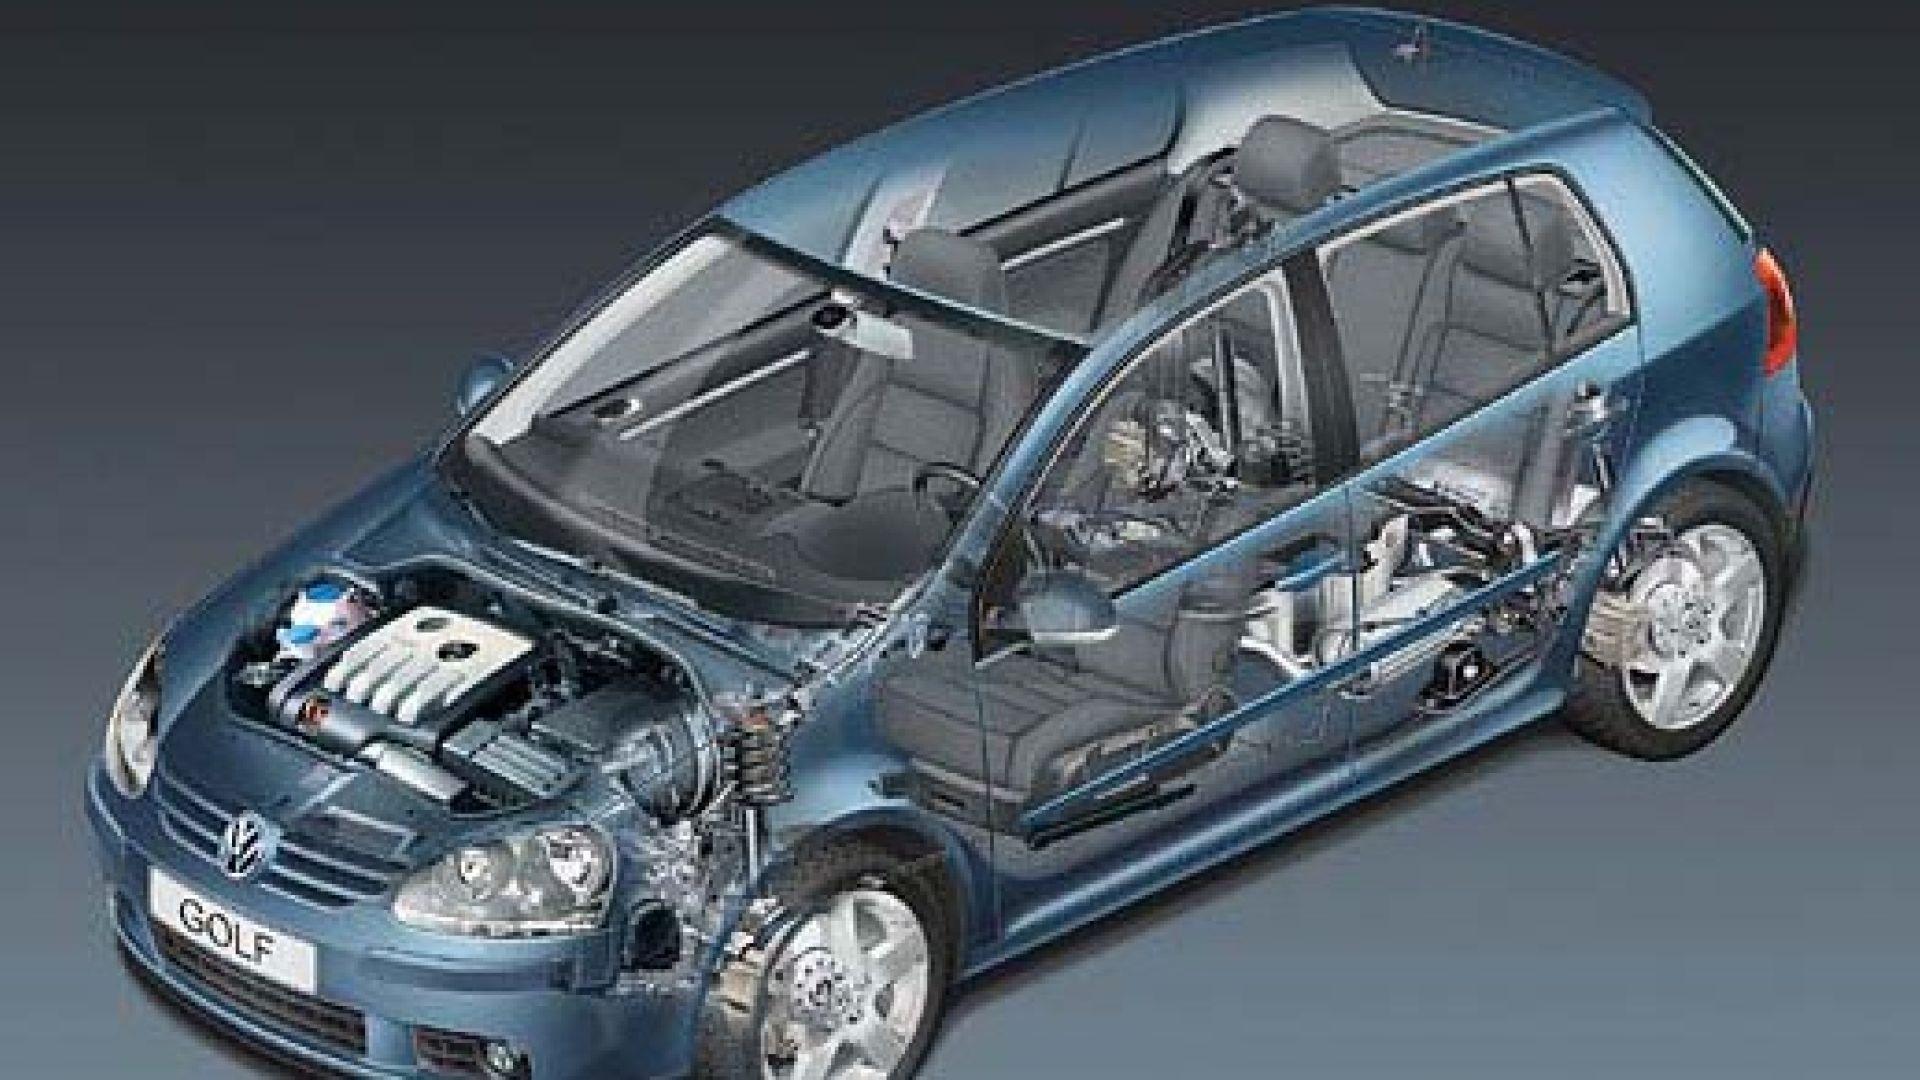 tdi engine diagram volkswagen golf 1 6 fsi motorbox  volkswagen golf 1 6 fsi motorbox